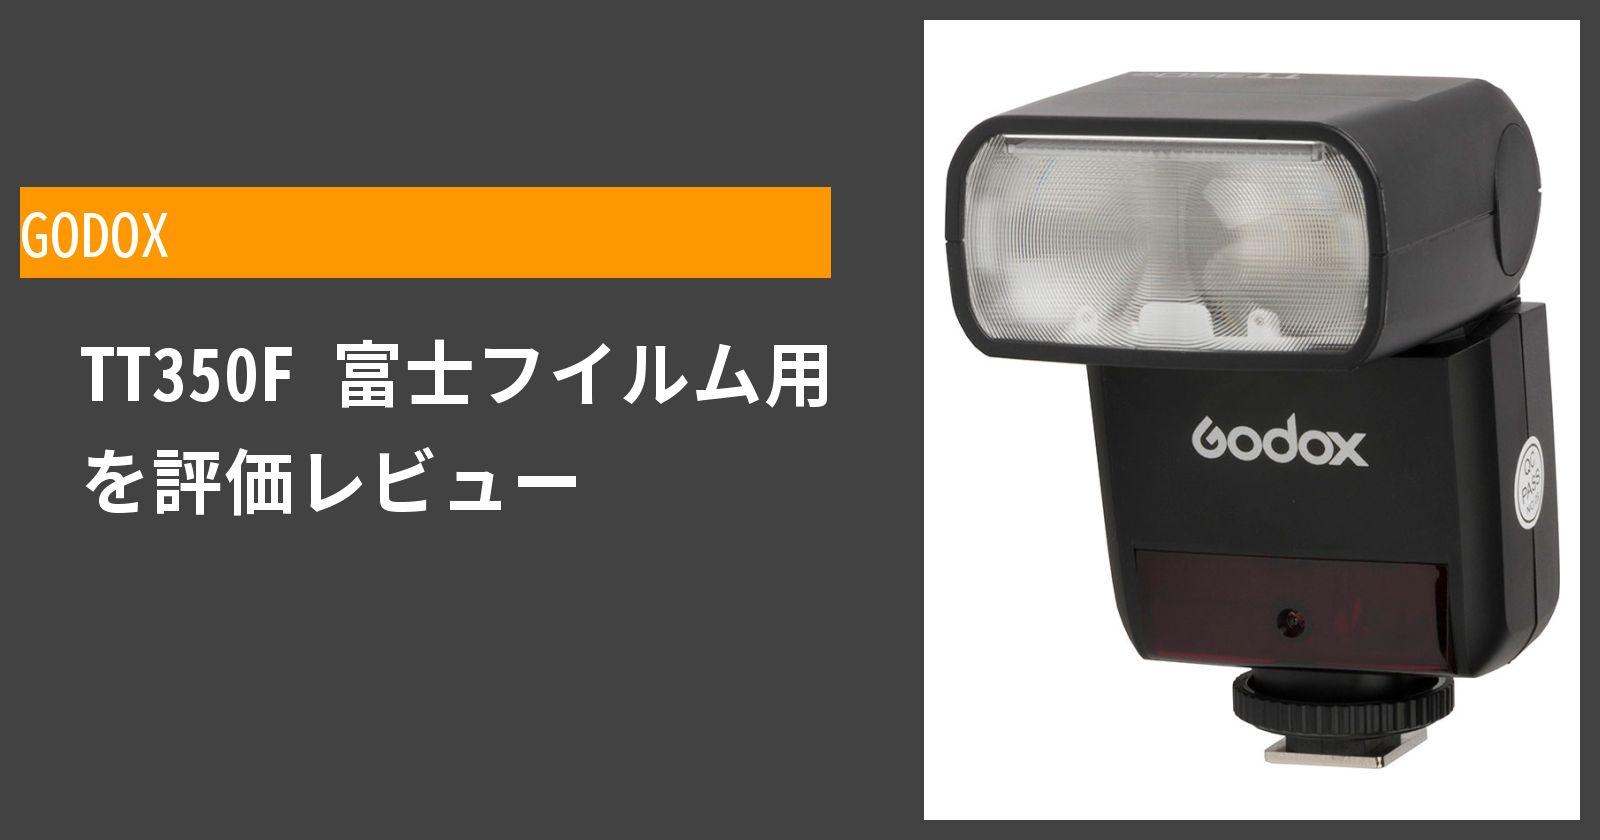 TT350F 富士フイルム用を徹底評価